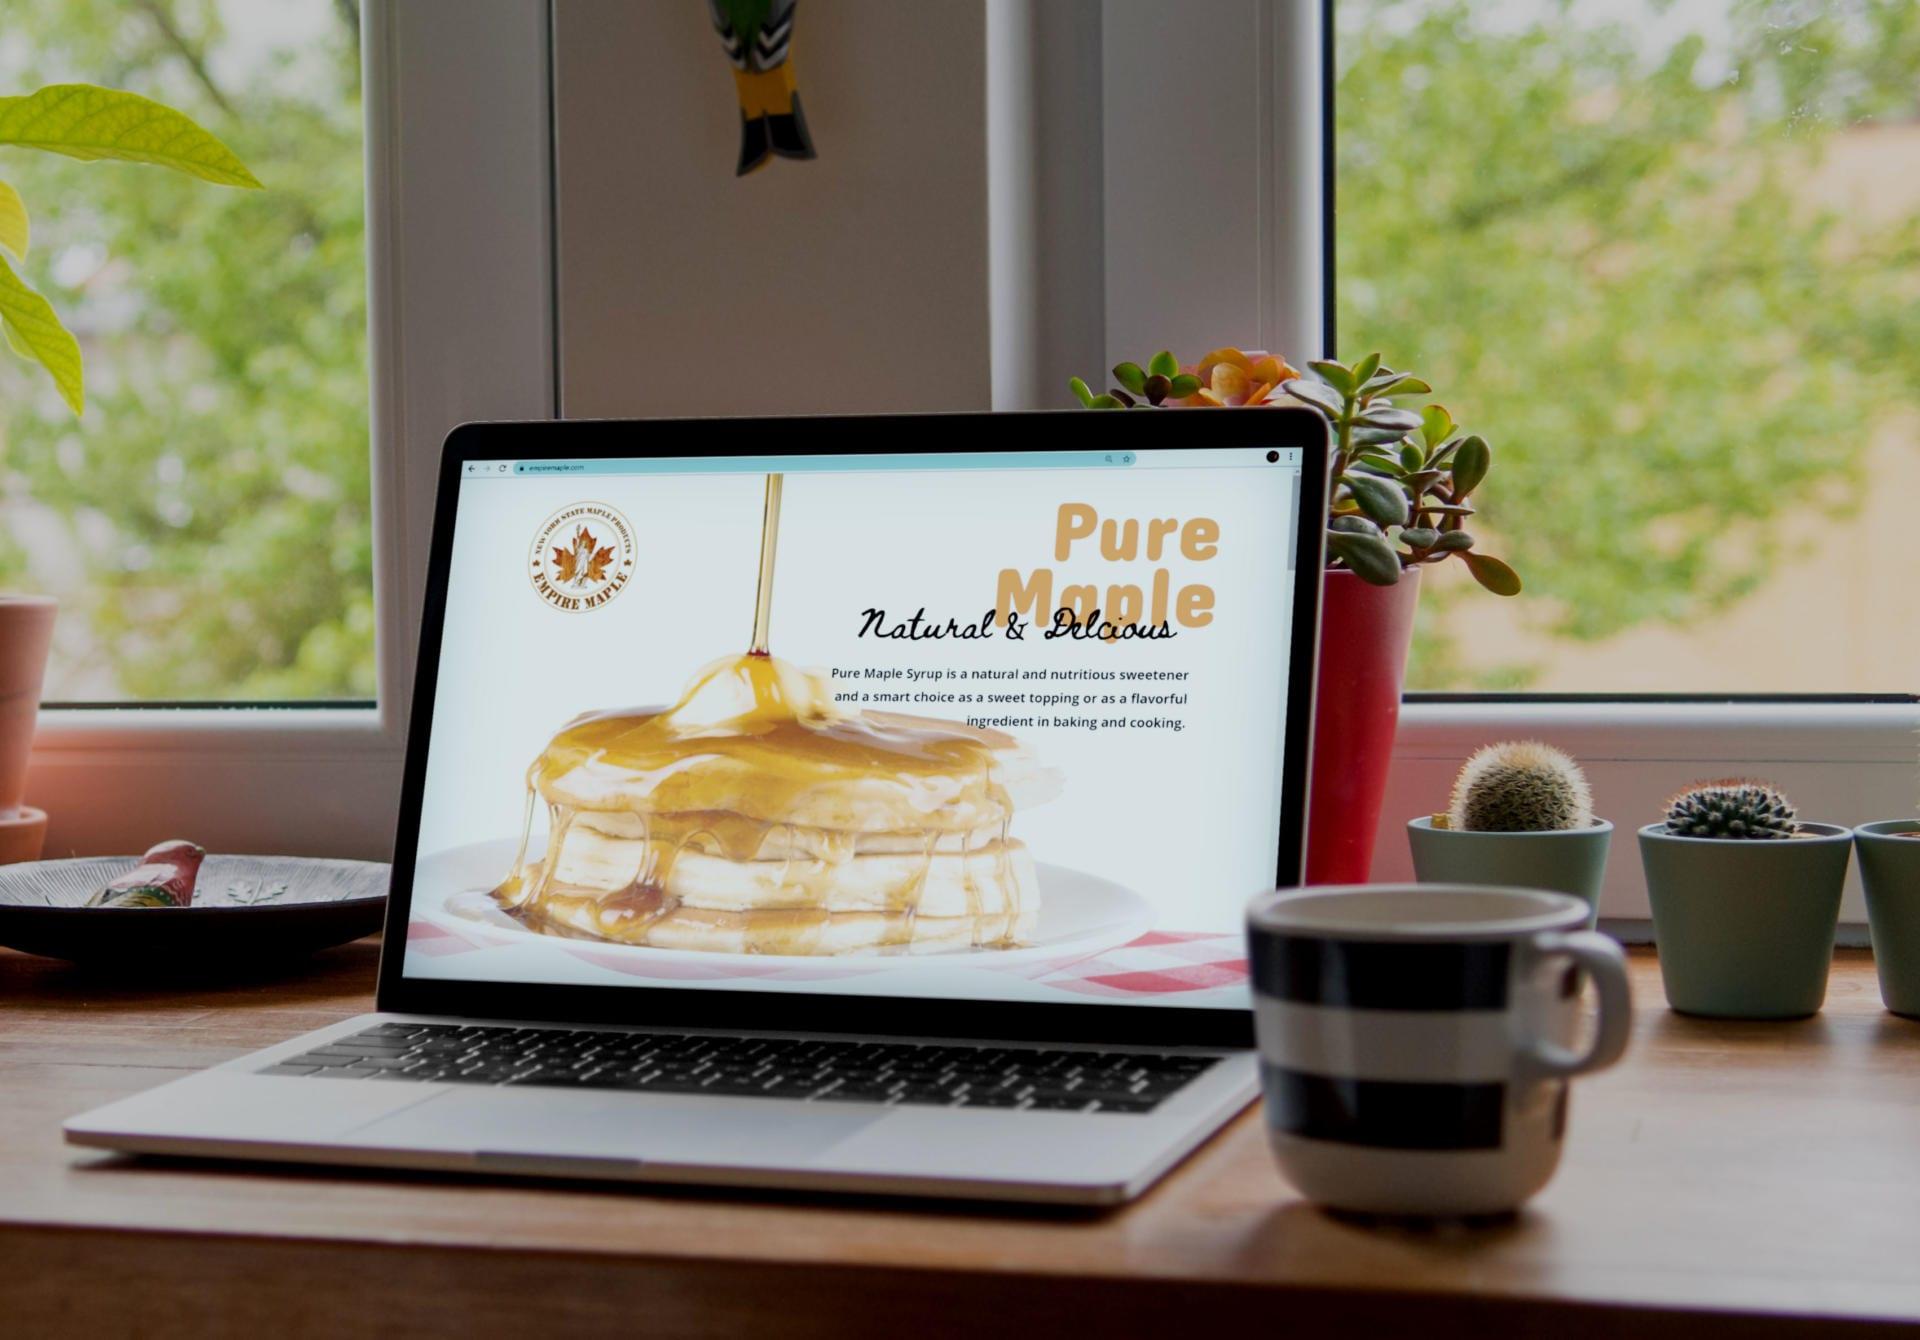 Buffalo Website Design Services used on Empire Maple Website Design